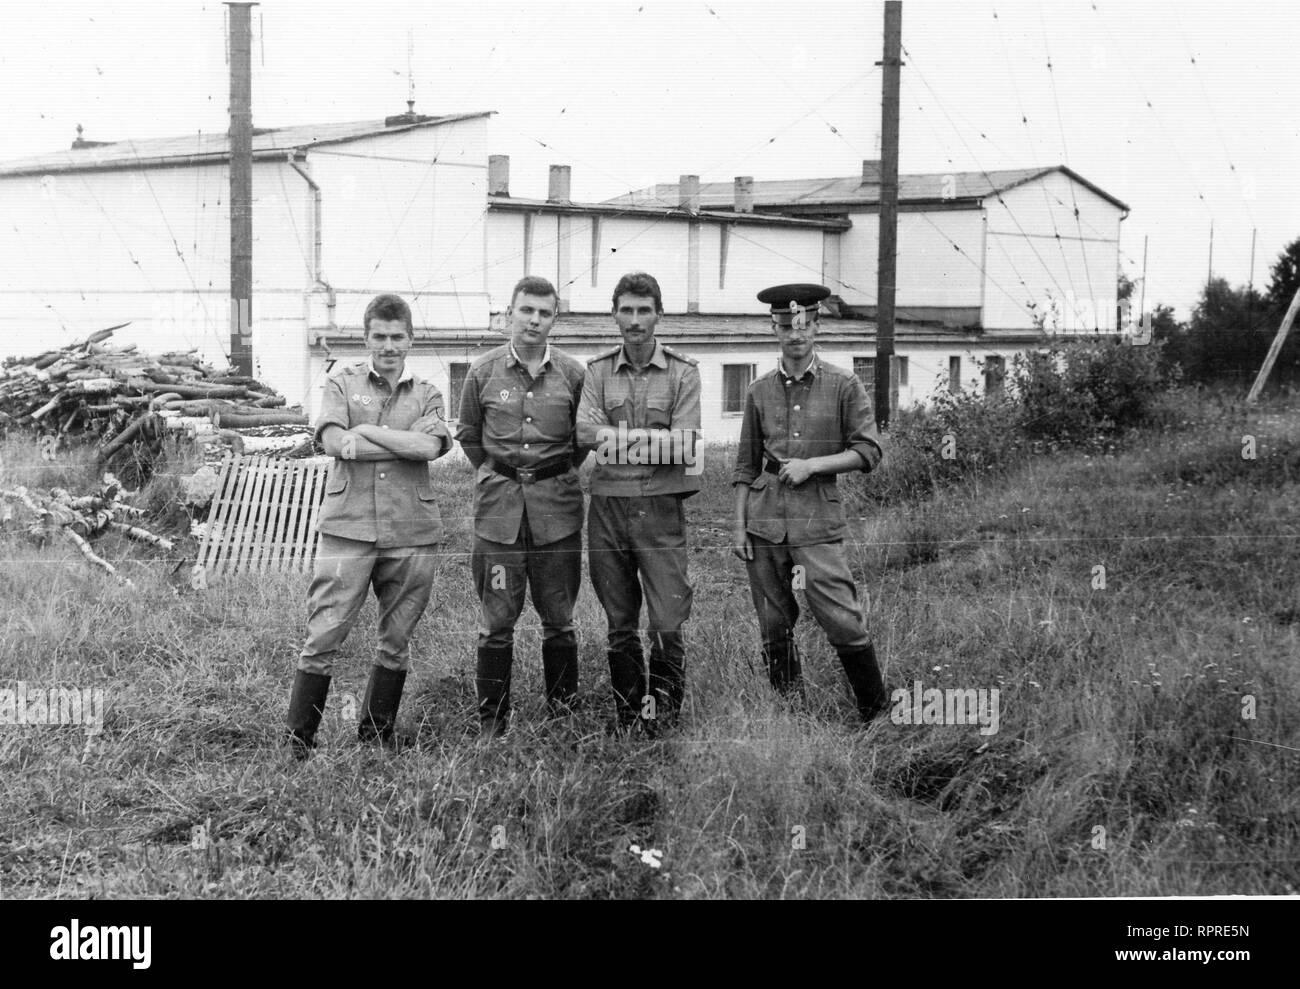 Soviet soldiers in Czechoslovakia 1989 year, near Milire, Tachov city region - Stock Image